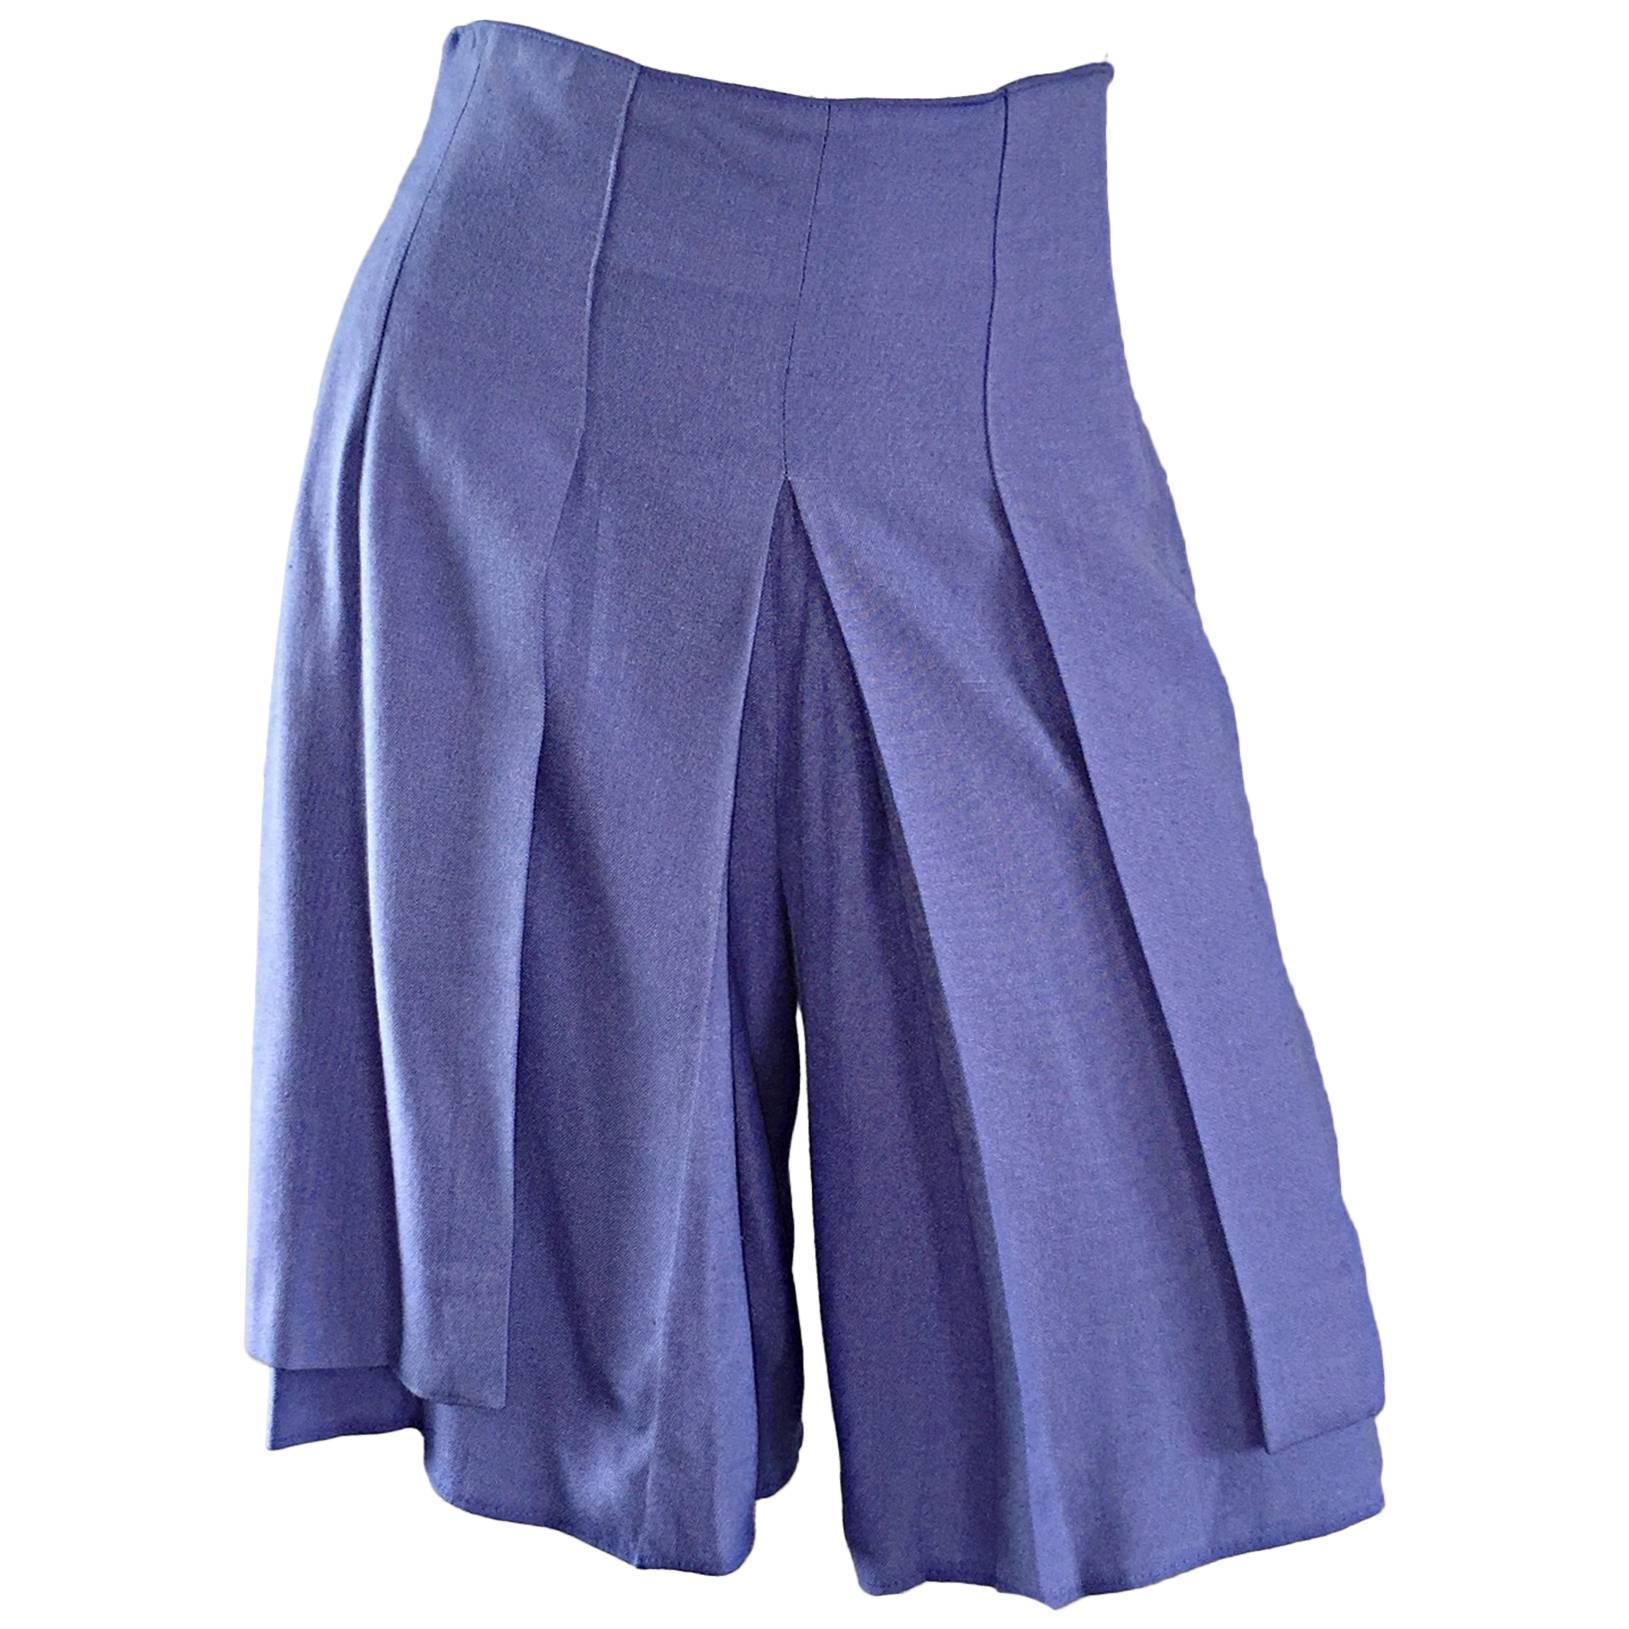 1980s Emanuelle Khanh Vintage High Wasited Periwinkle Blue Shorts Made in France